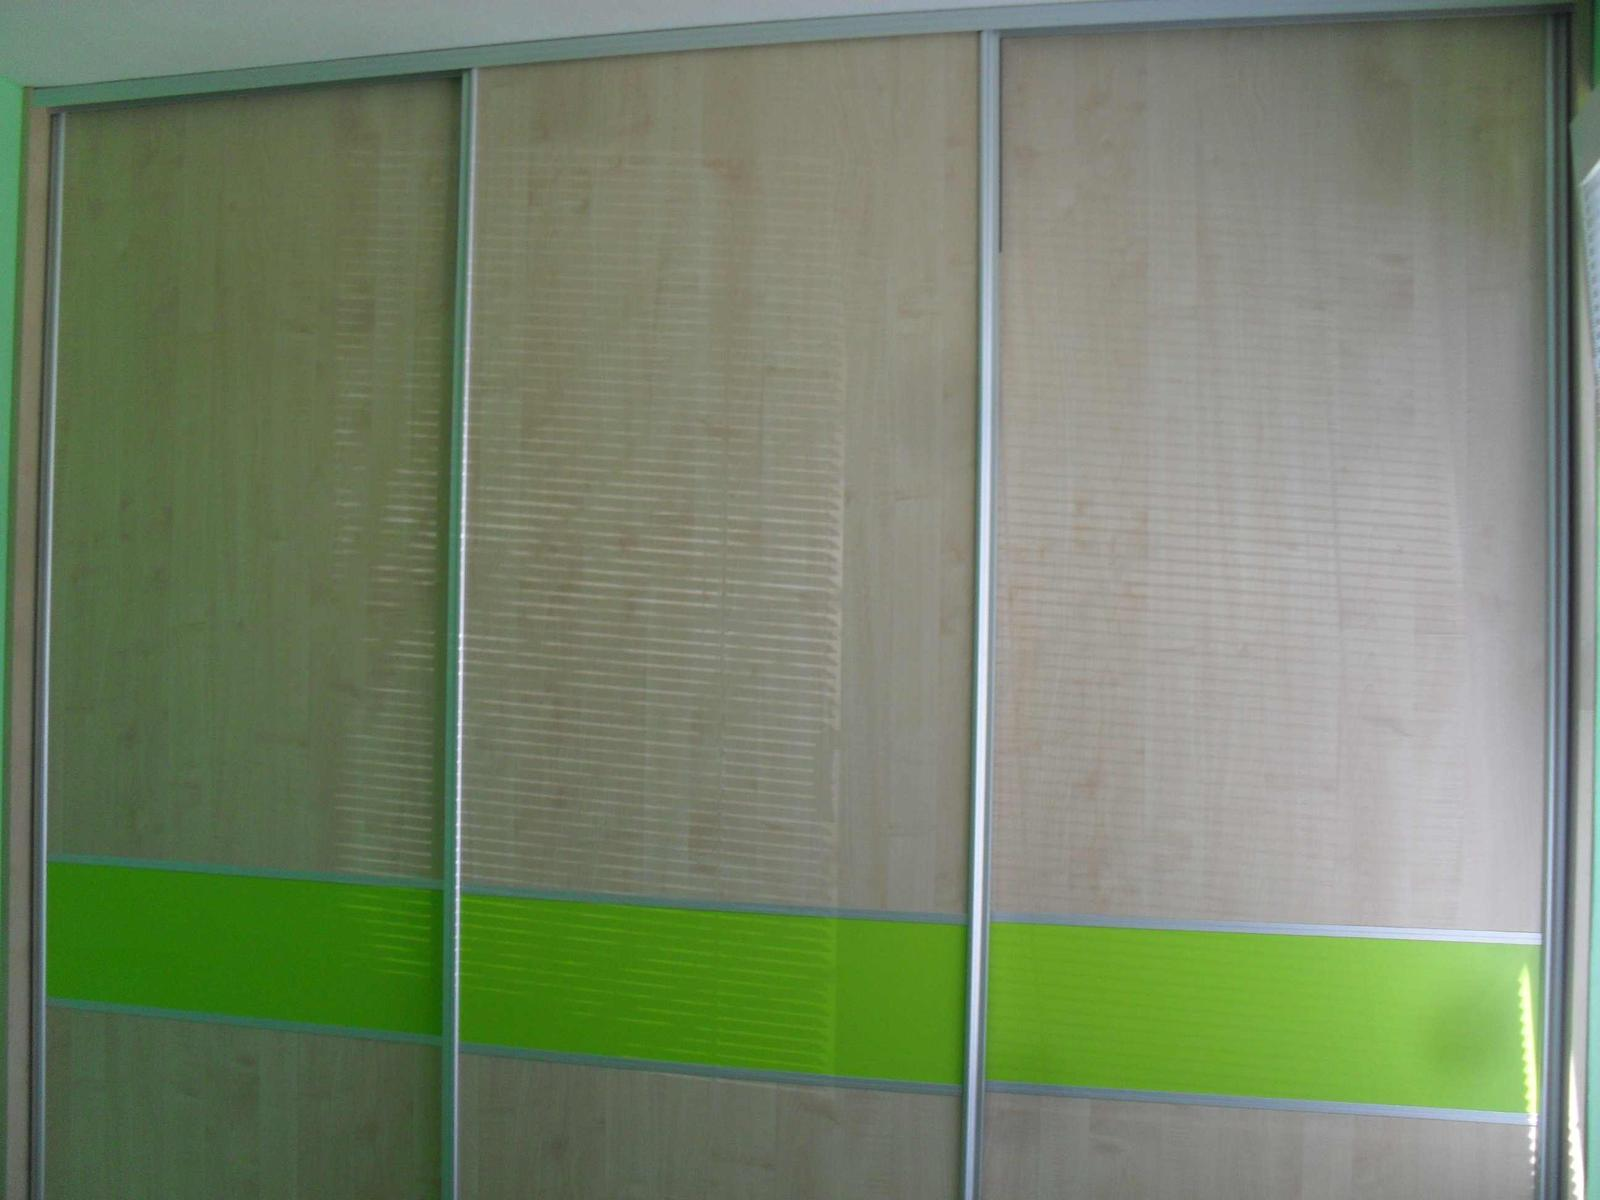 Vstavané skrine Martin Benko Bošany - Obrázok č. 44